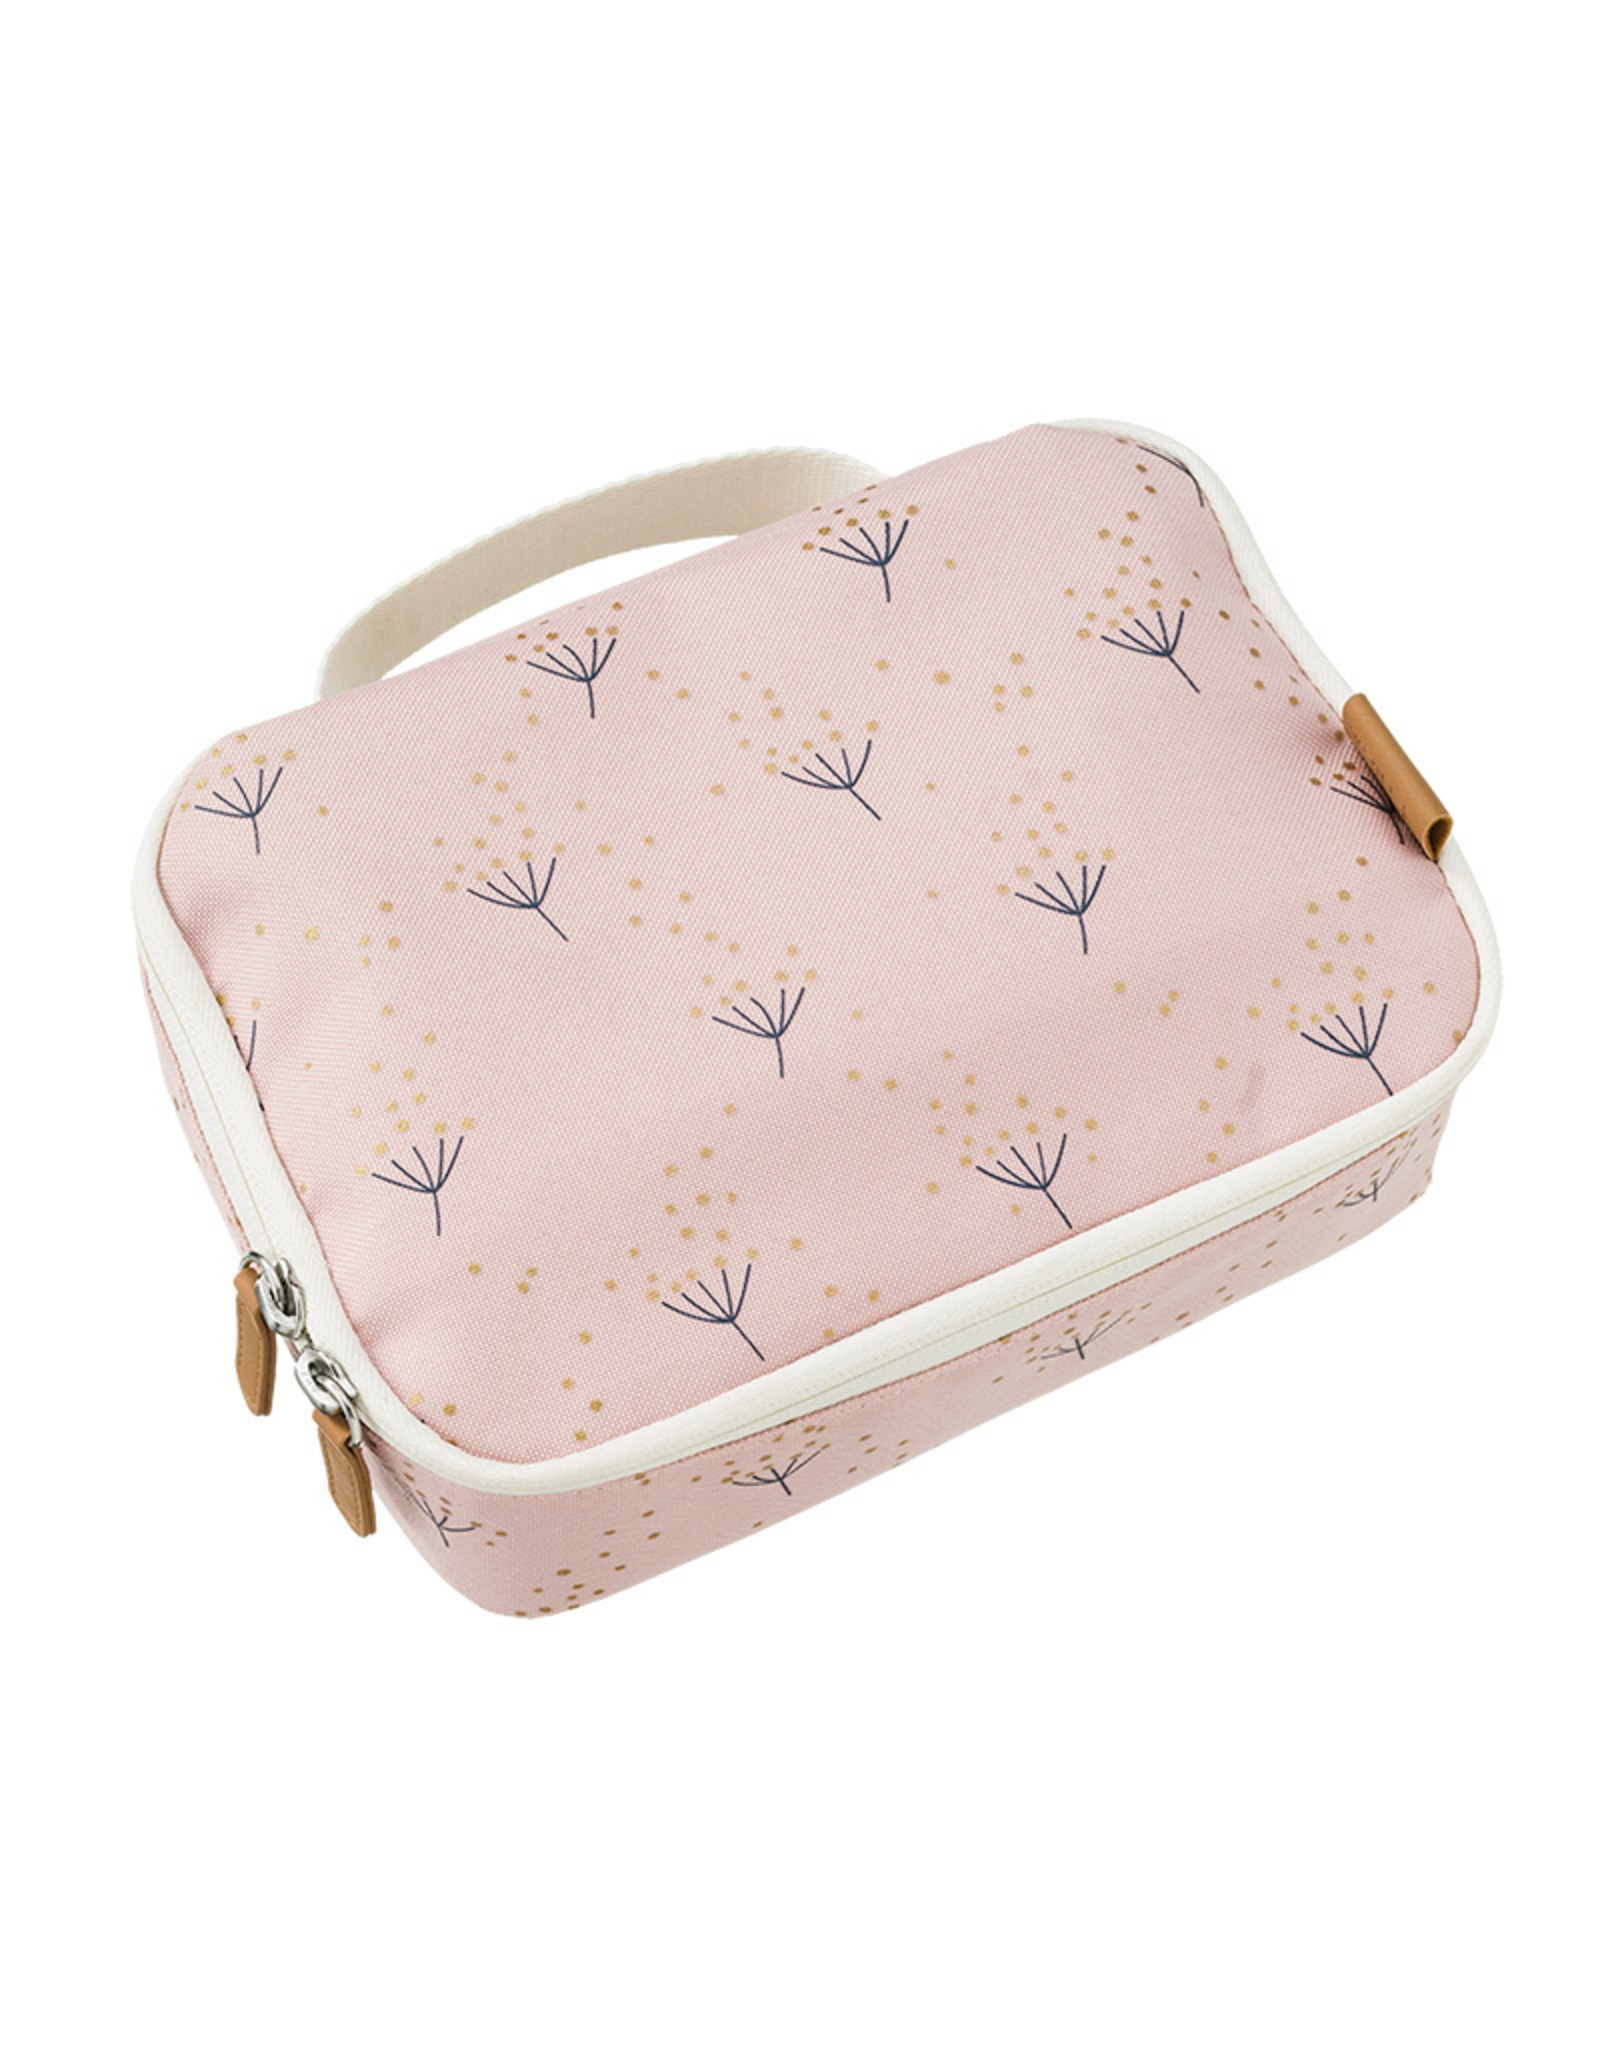 Fresk Lunch Bag - Dandelion